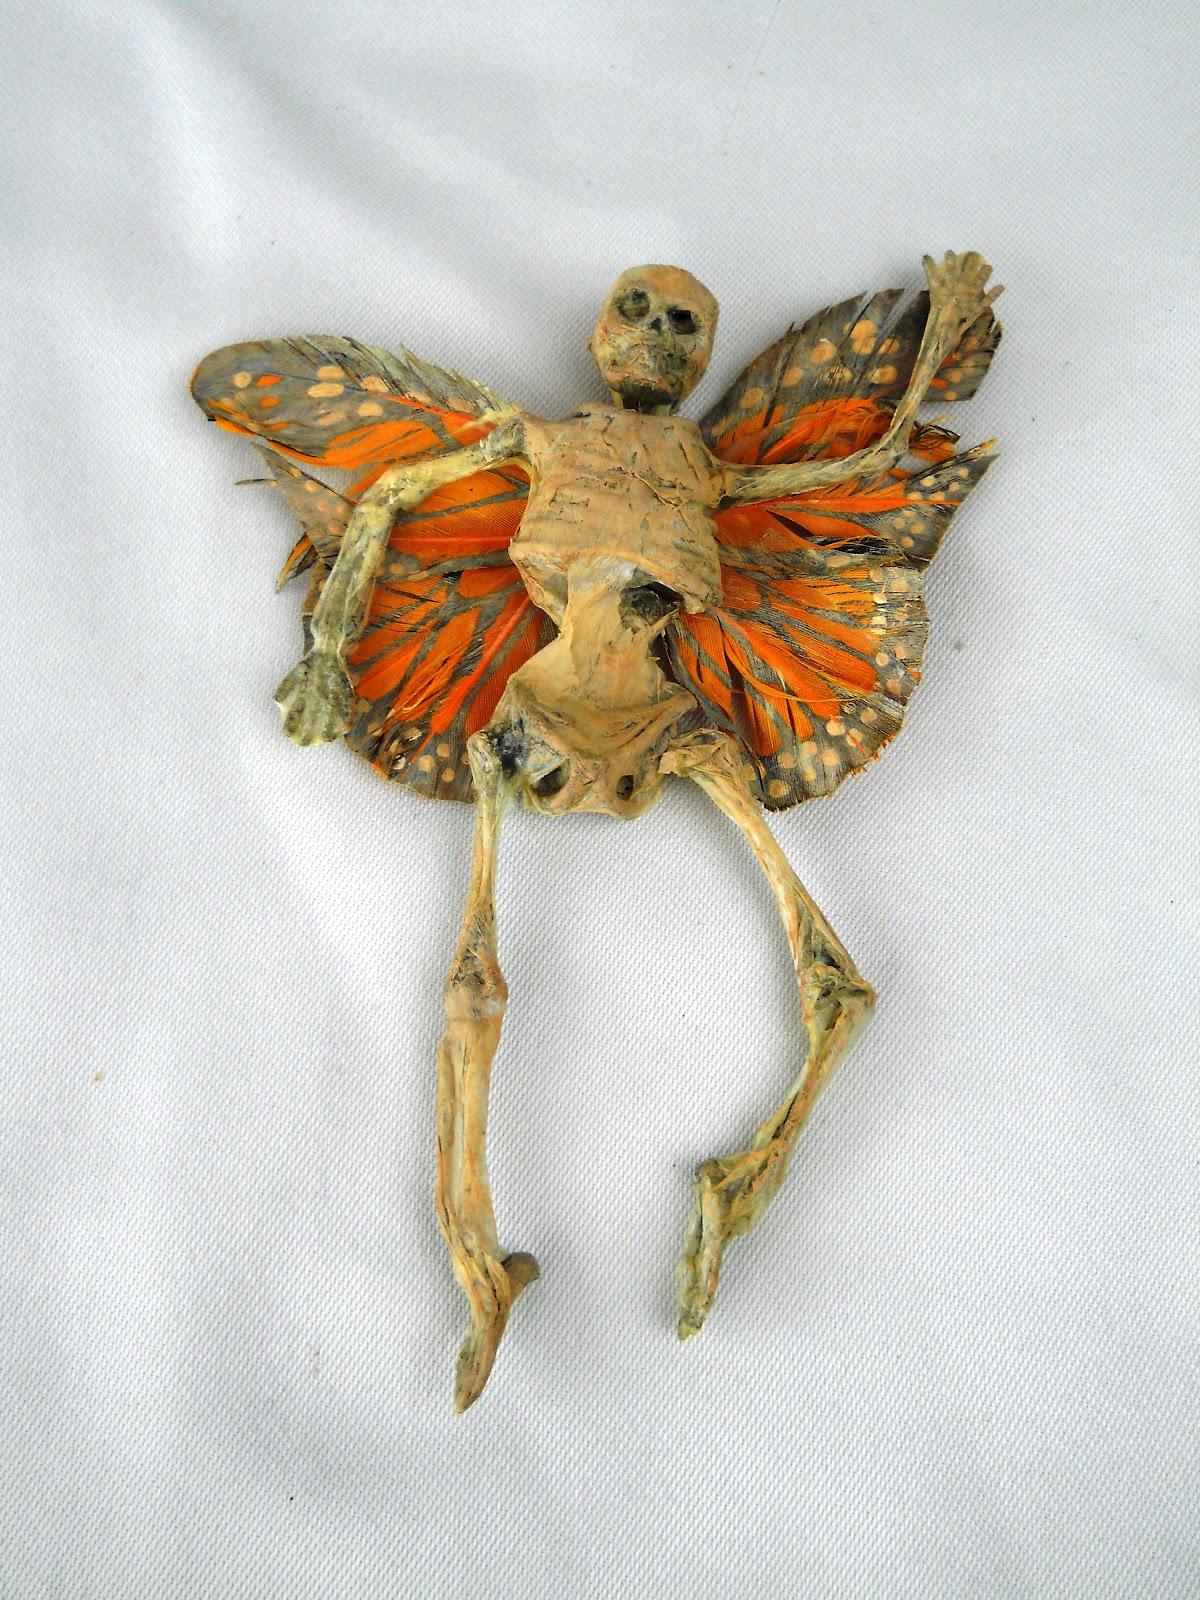 Beau Monde Crafting: Mummified Fairies